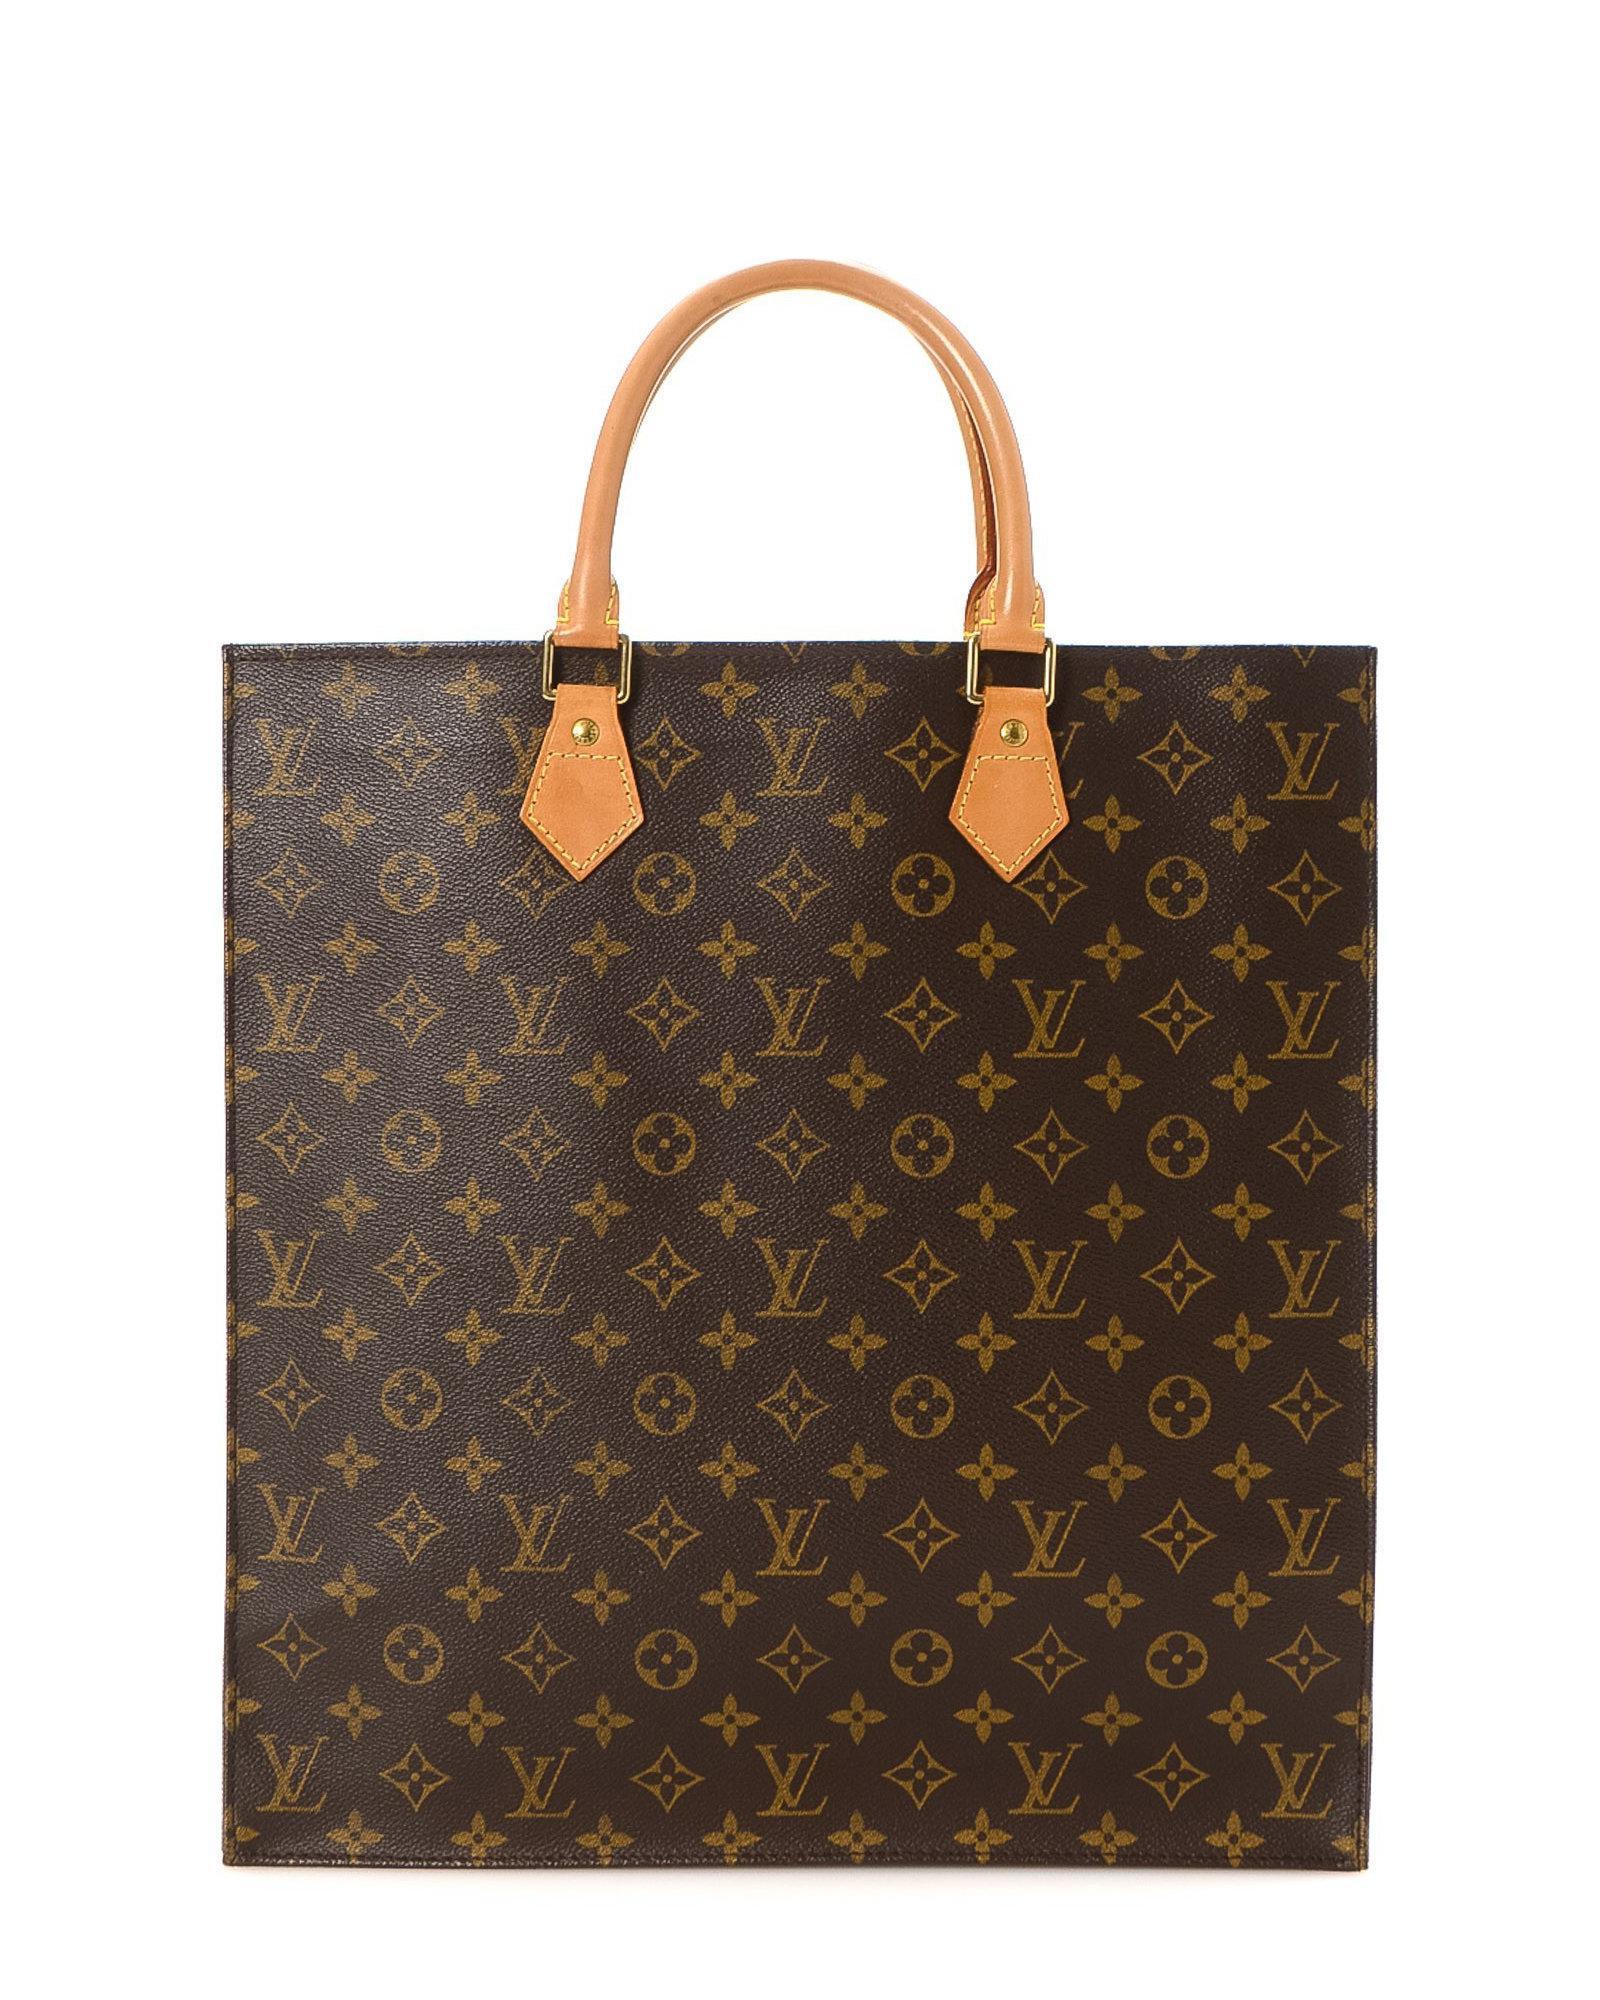 c2d66bdbb26e Lyst - Louis Vuitton Sac Plat Pm Tote Bag - Vintage in Brown